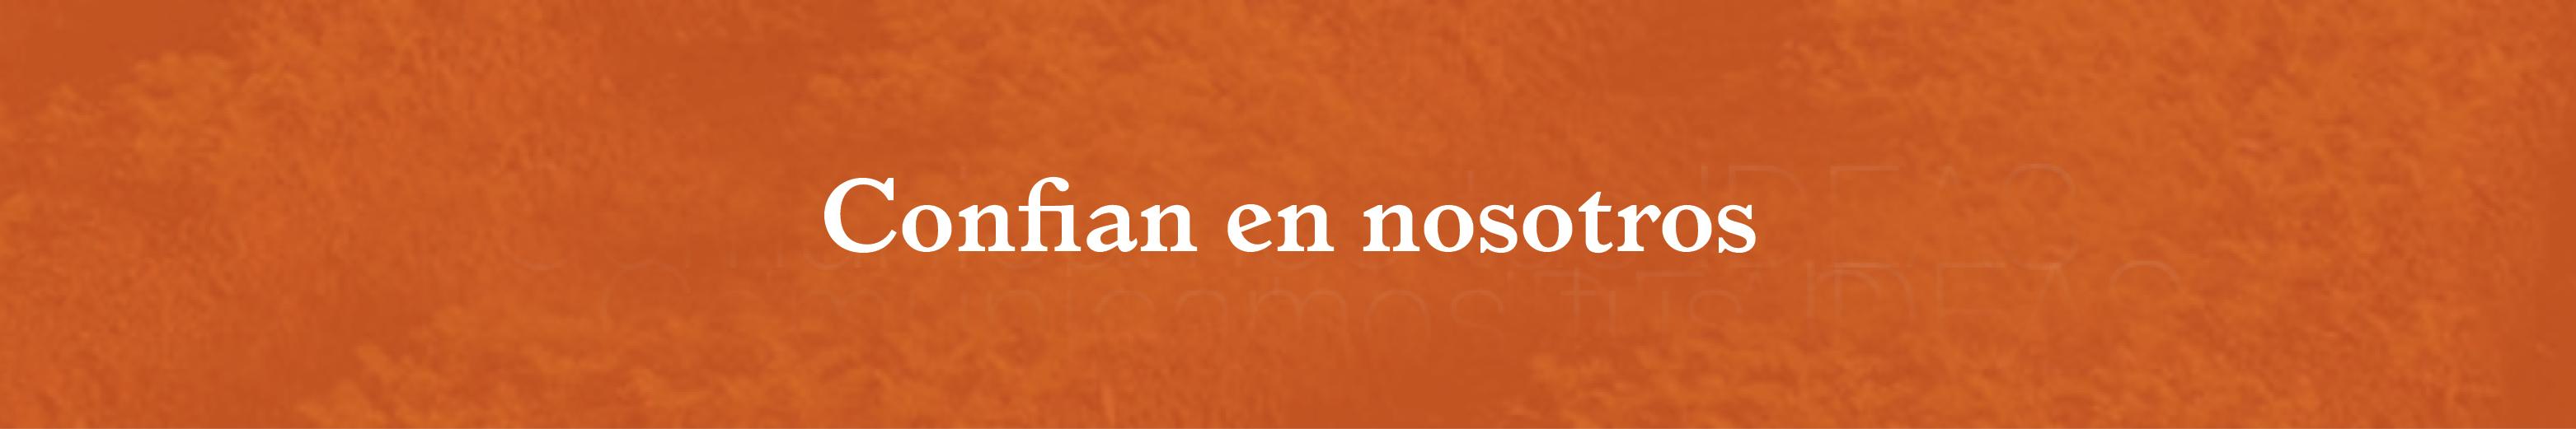 banner-naranja5